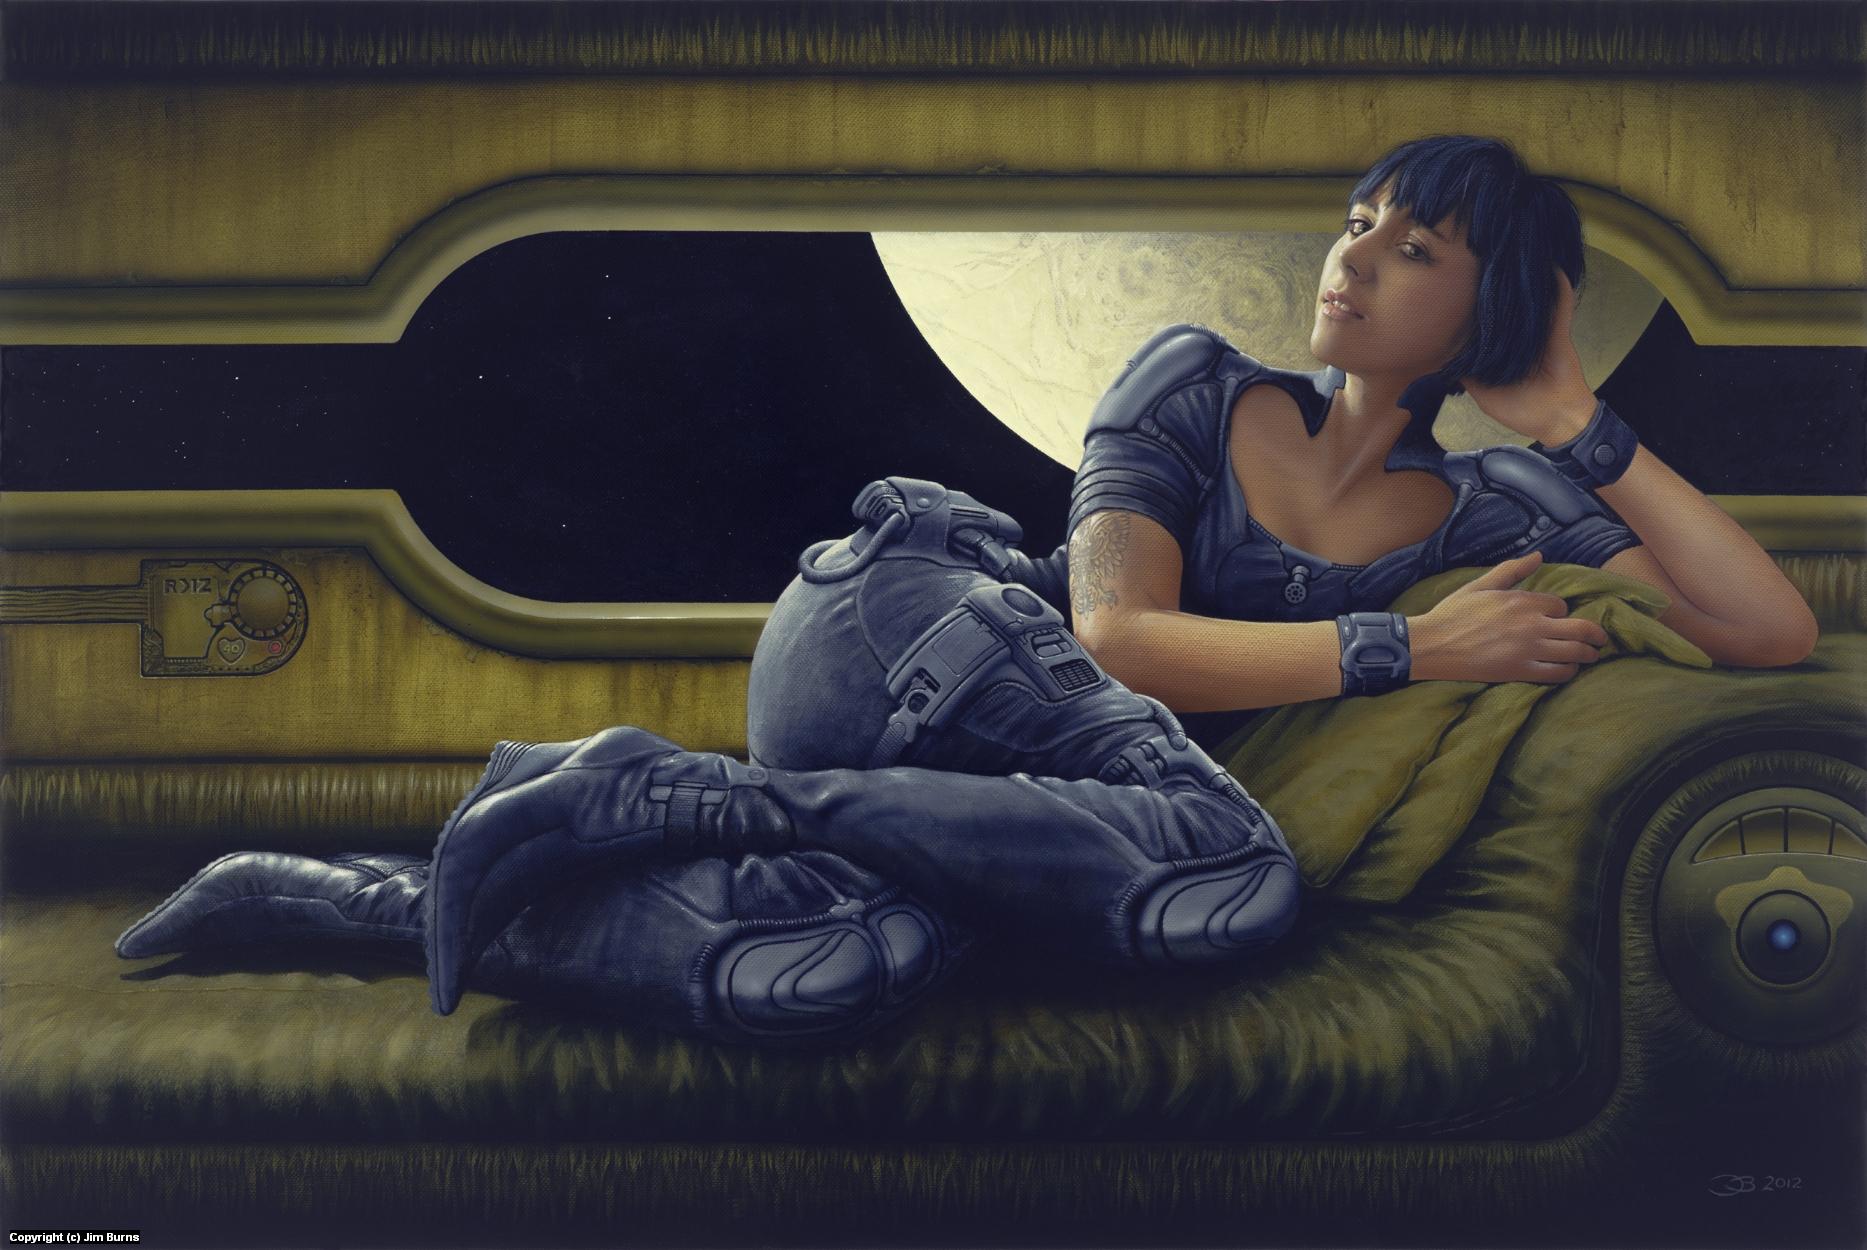 Portrait of Izabella Skrzyszewska  Artwork by Jim Burns